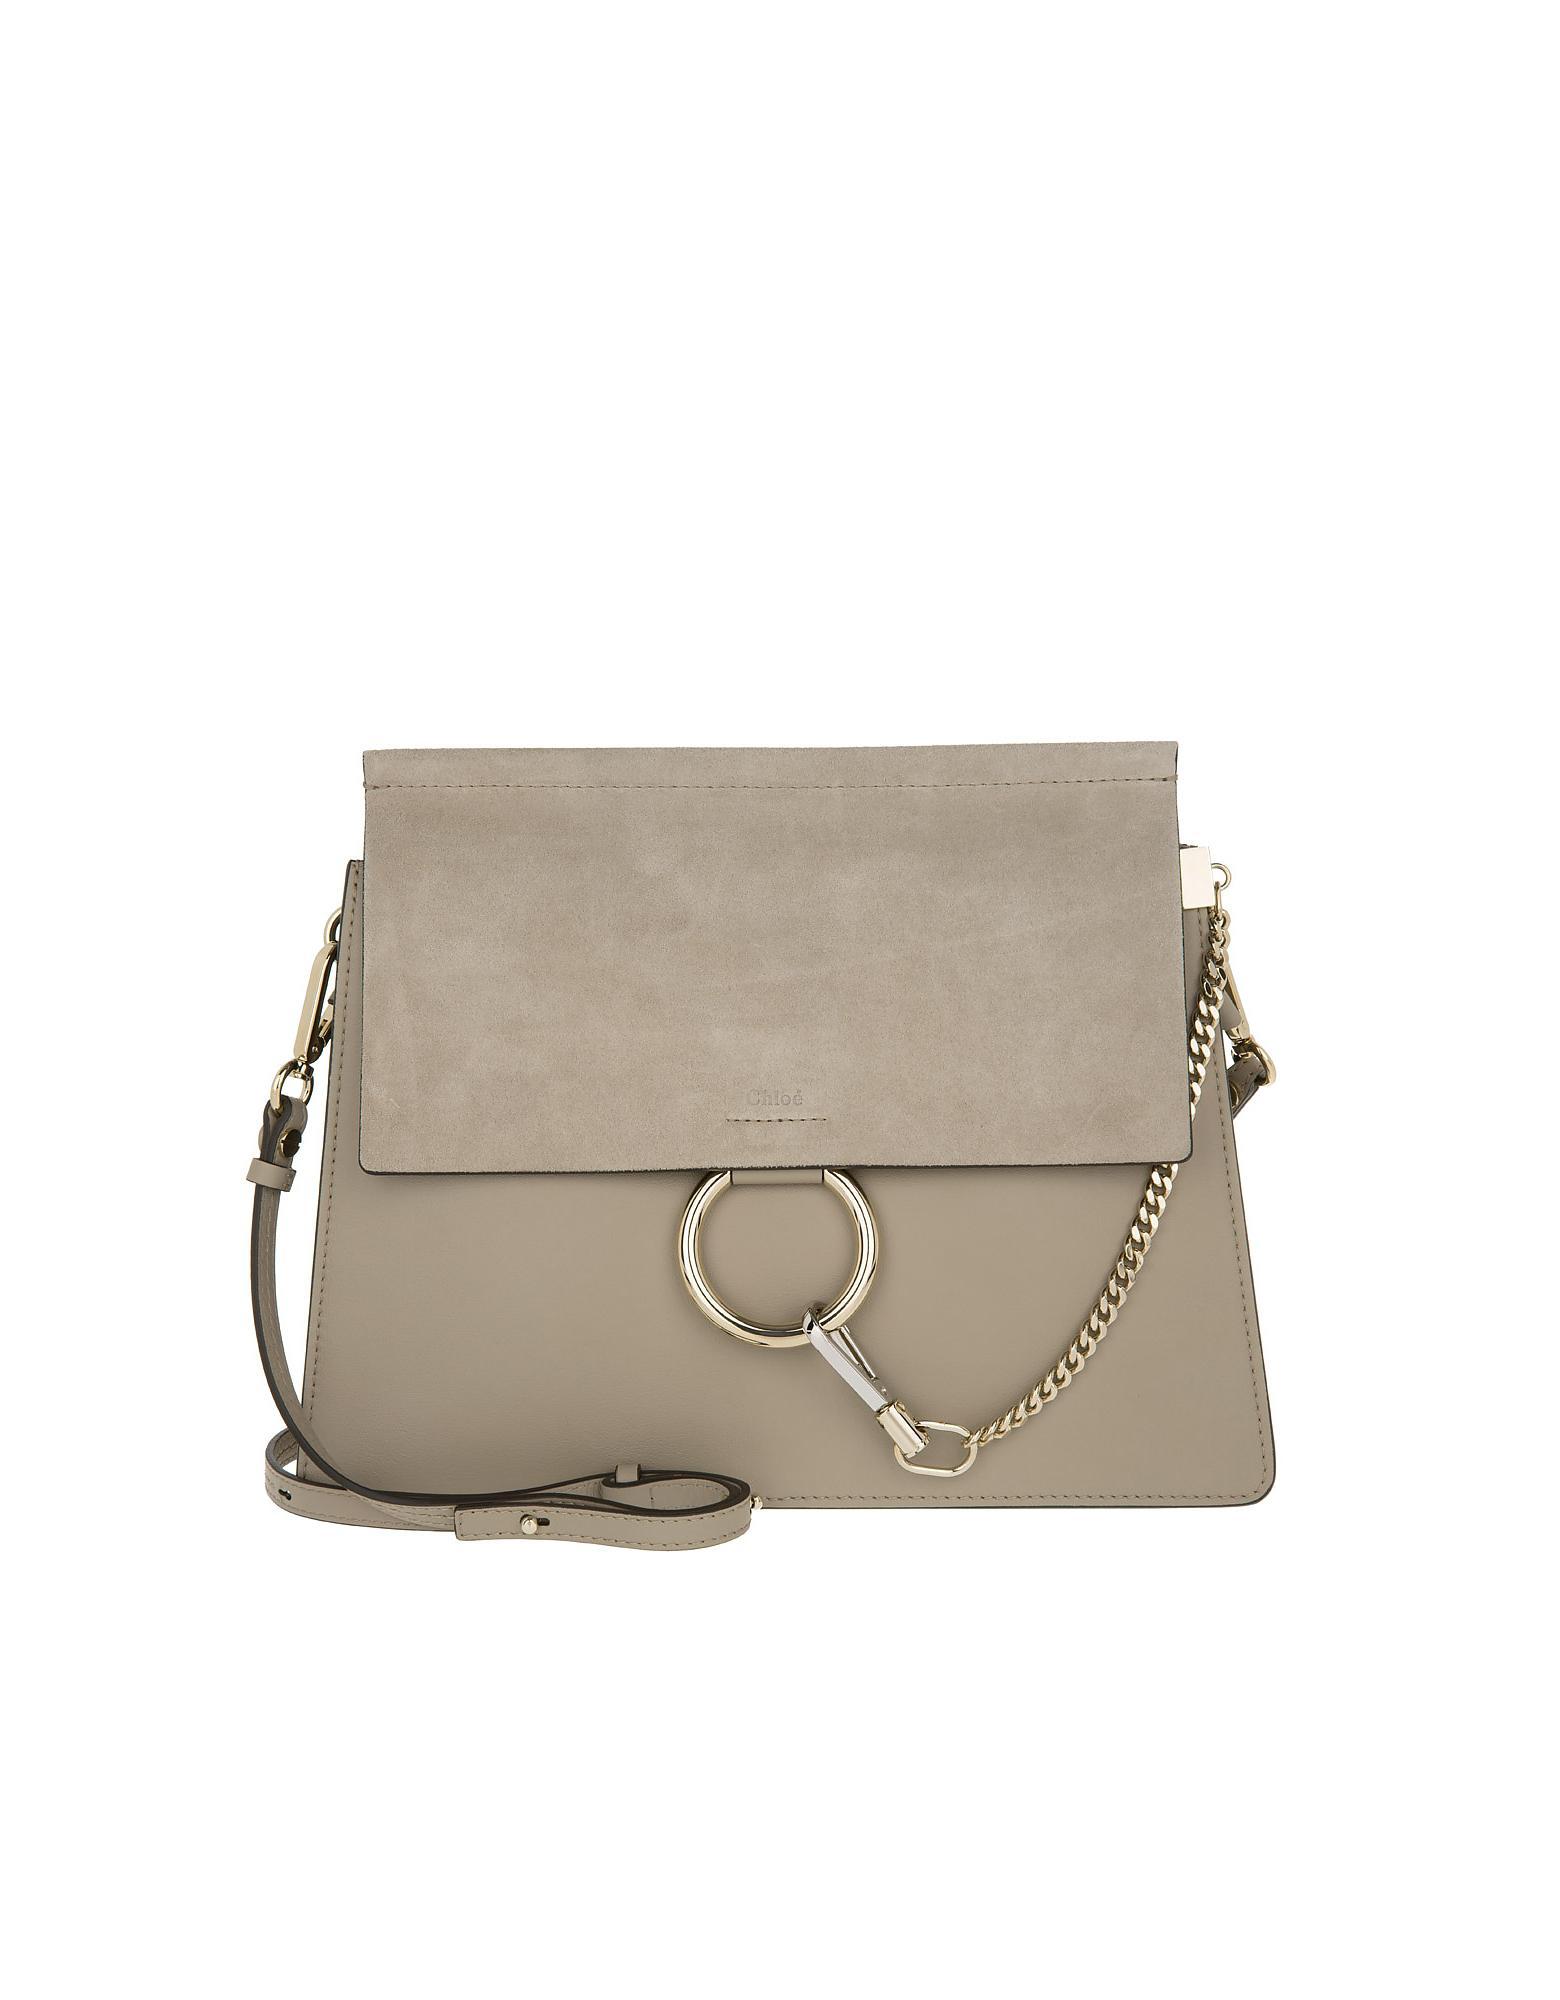 14bbfdd02fd7c Lyst - Chloé Faye Shoulder Bag Motty Grey in Gray